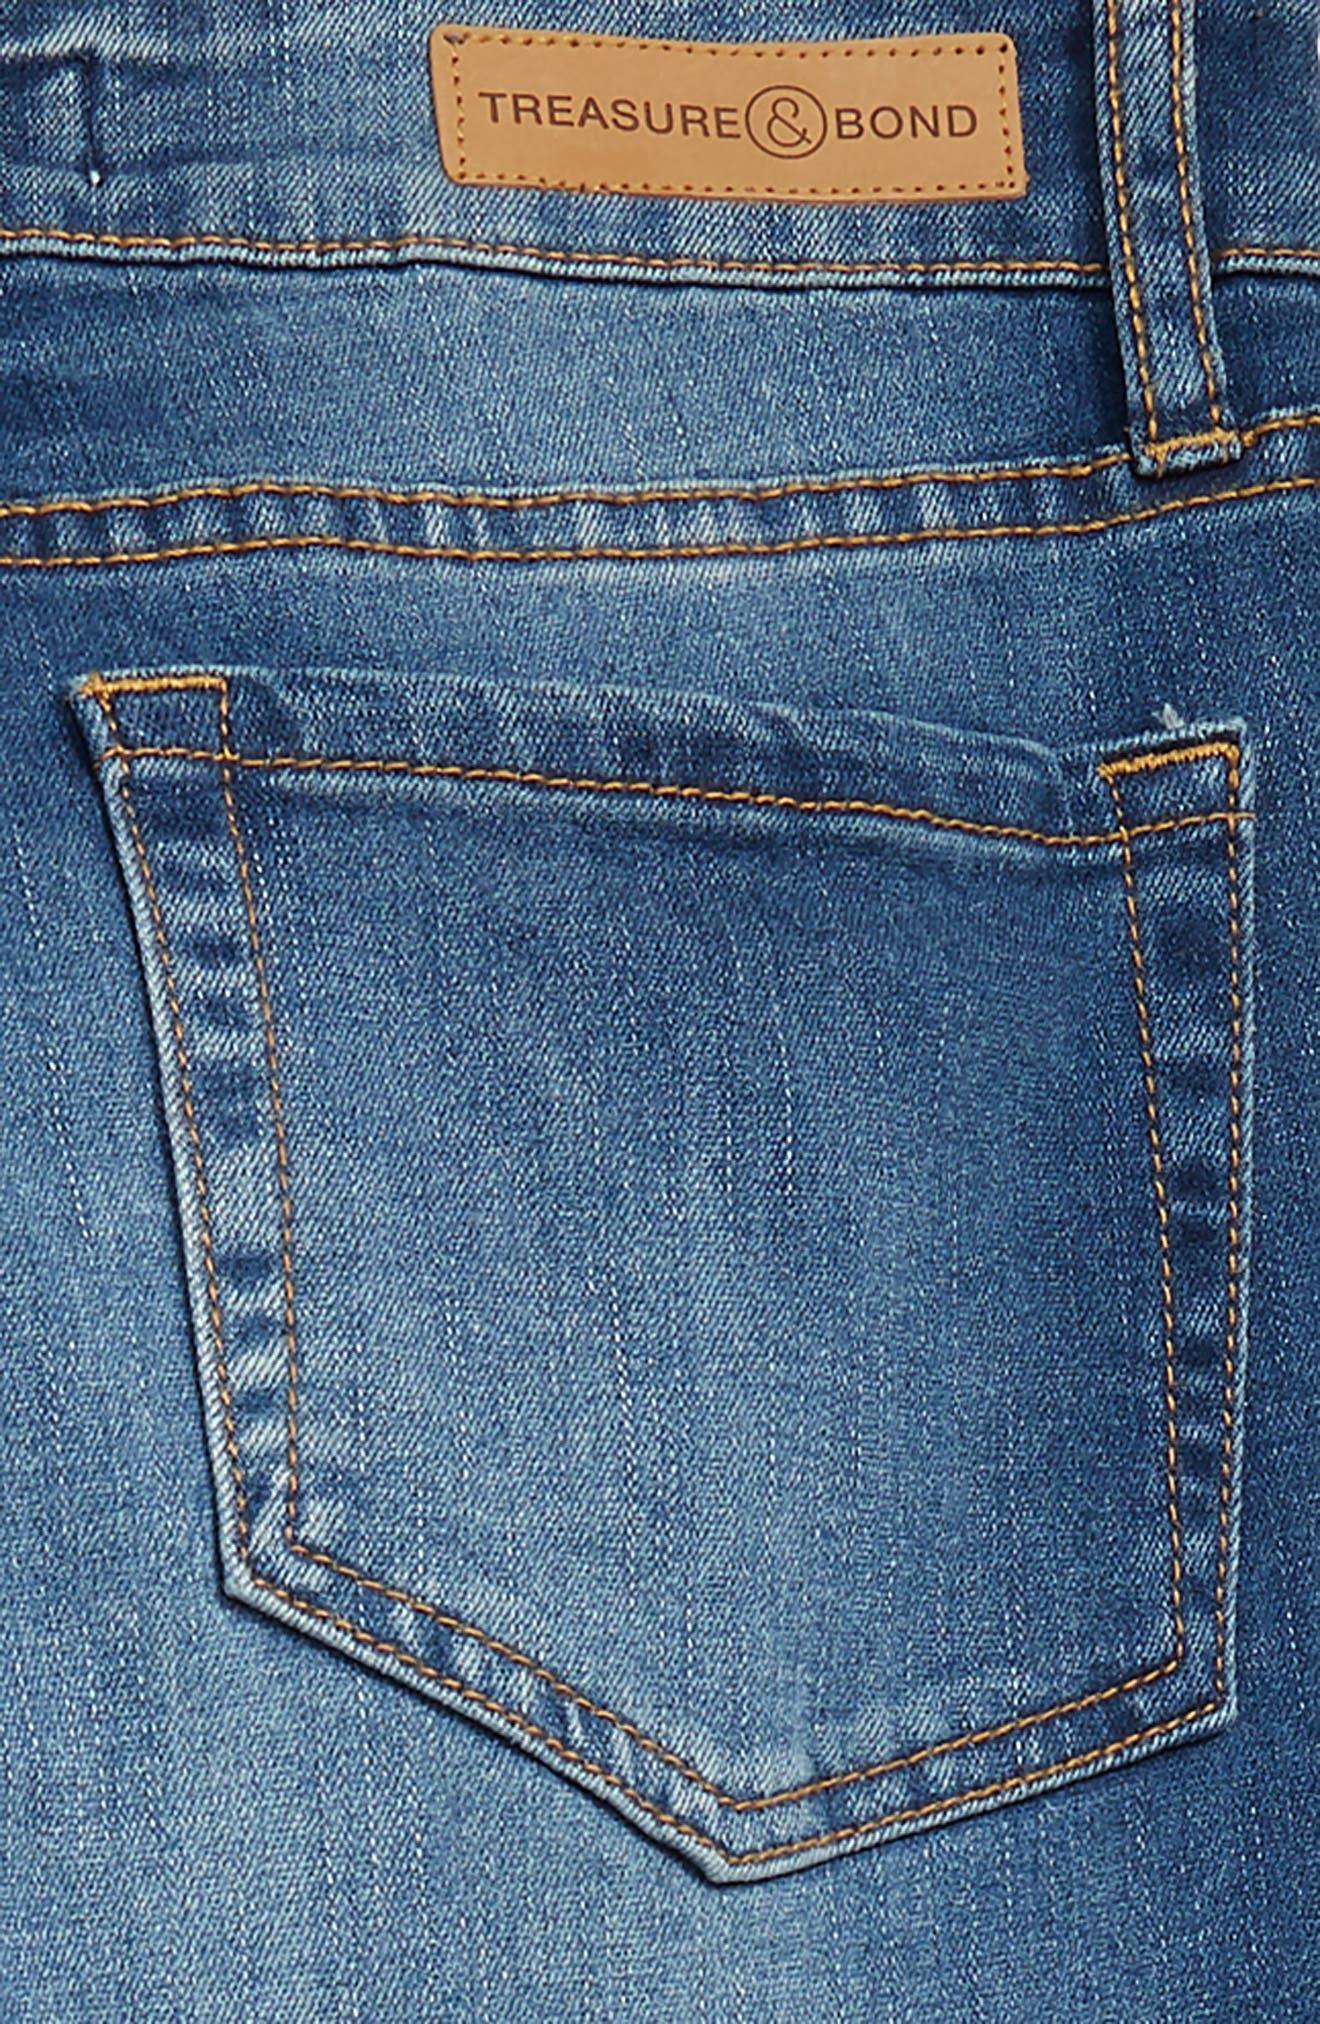 Sparkle Distressed Girlfriend Jeans,                             Alternate thumbnail 2, color,                             FAIRY WASH